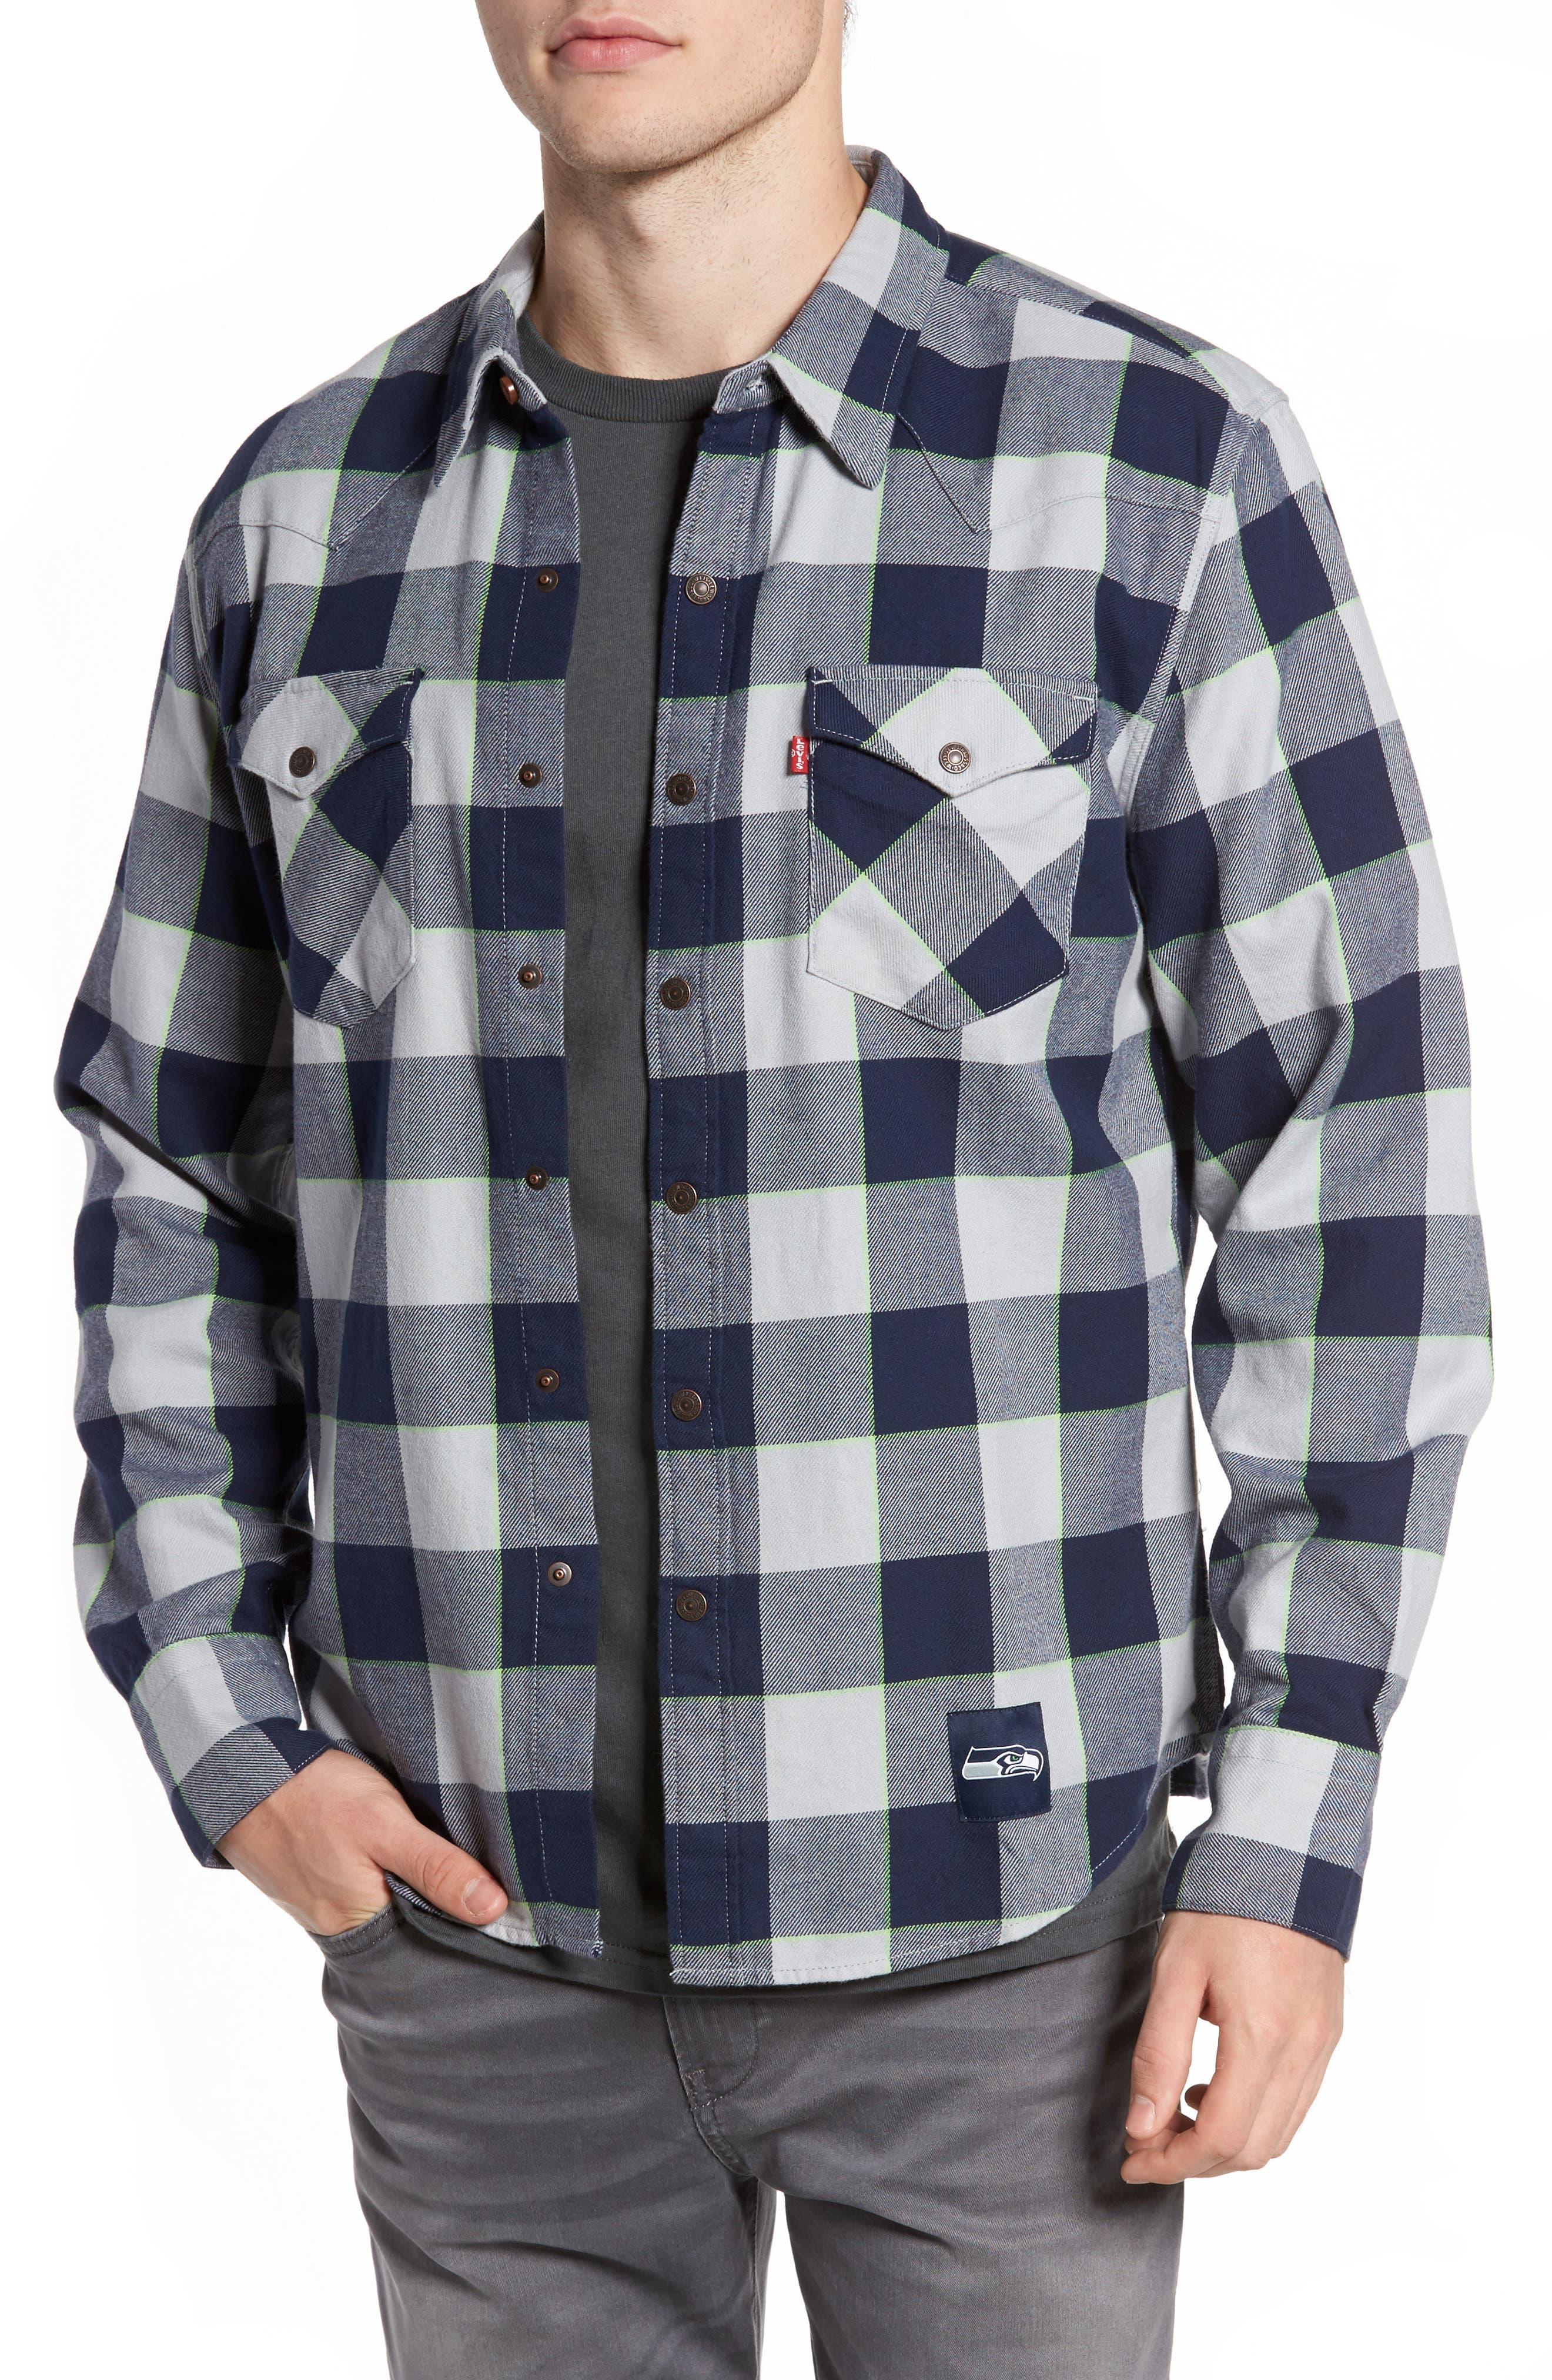 Main Image - Levi's® NFL Seahawks - Barstow Plaid Western Shirt